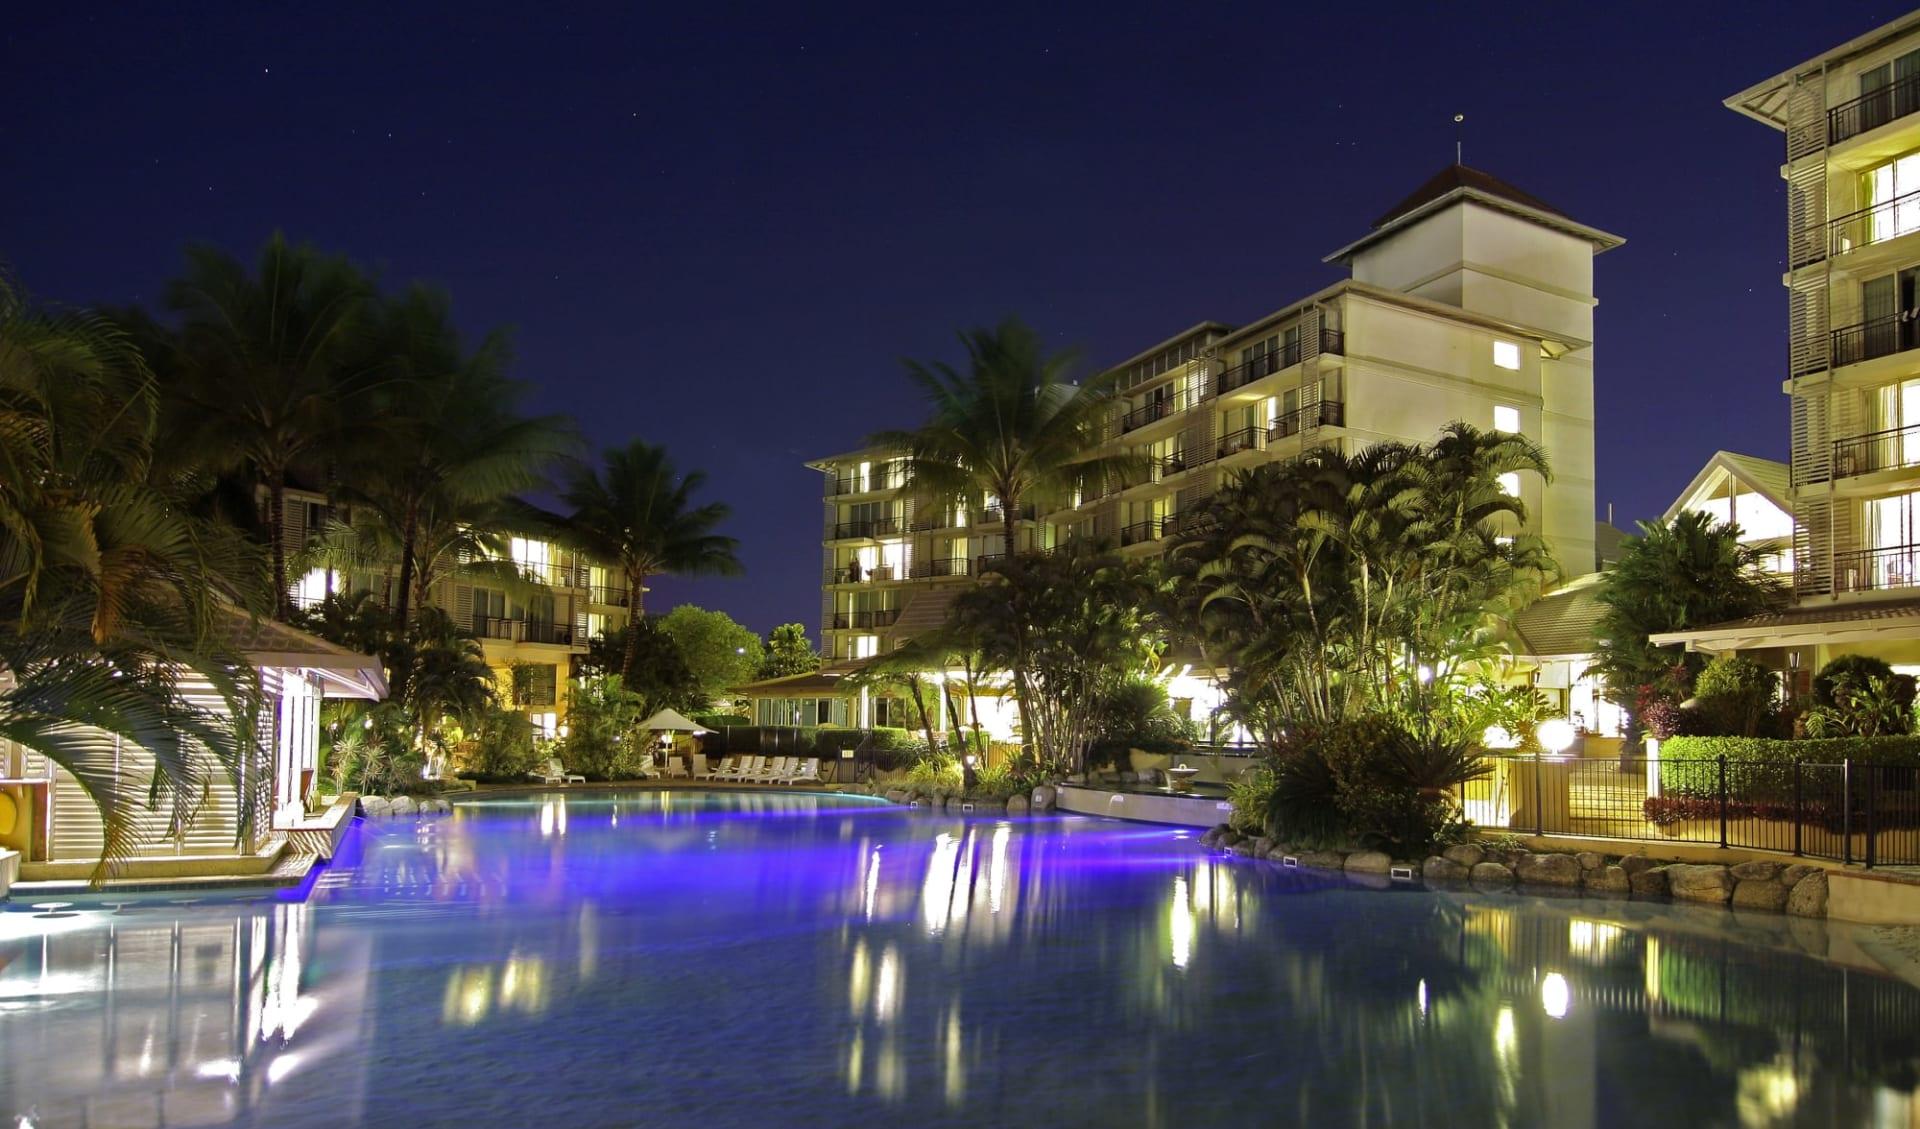 Novotel Cairns Oasis Resort: Pool Novotel Cairns Oasis Resort Hotel Anlage bei Nacht